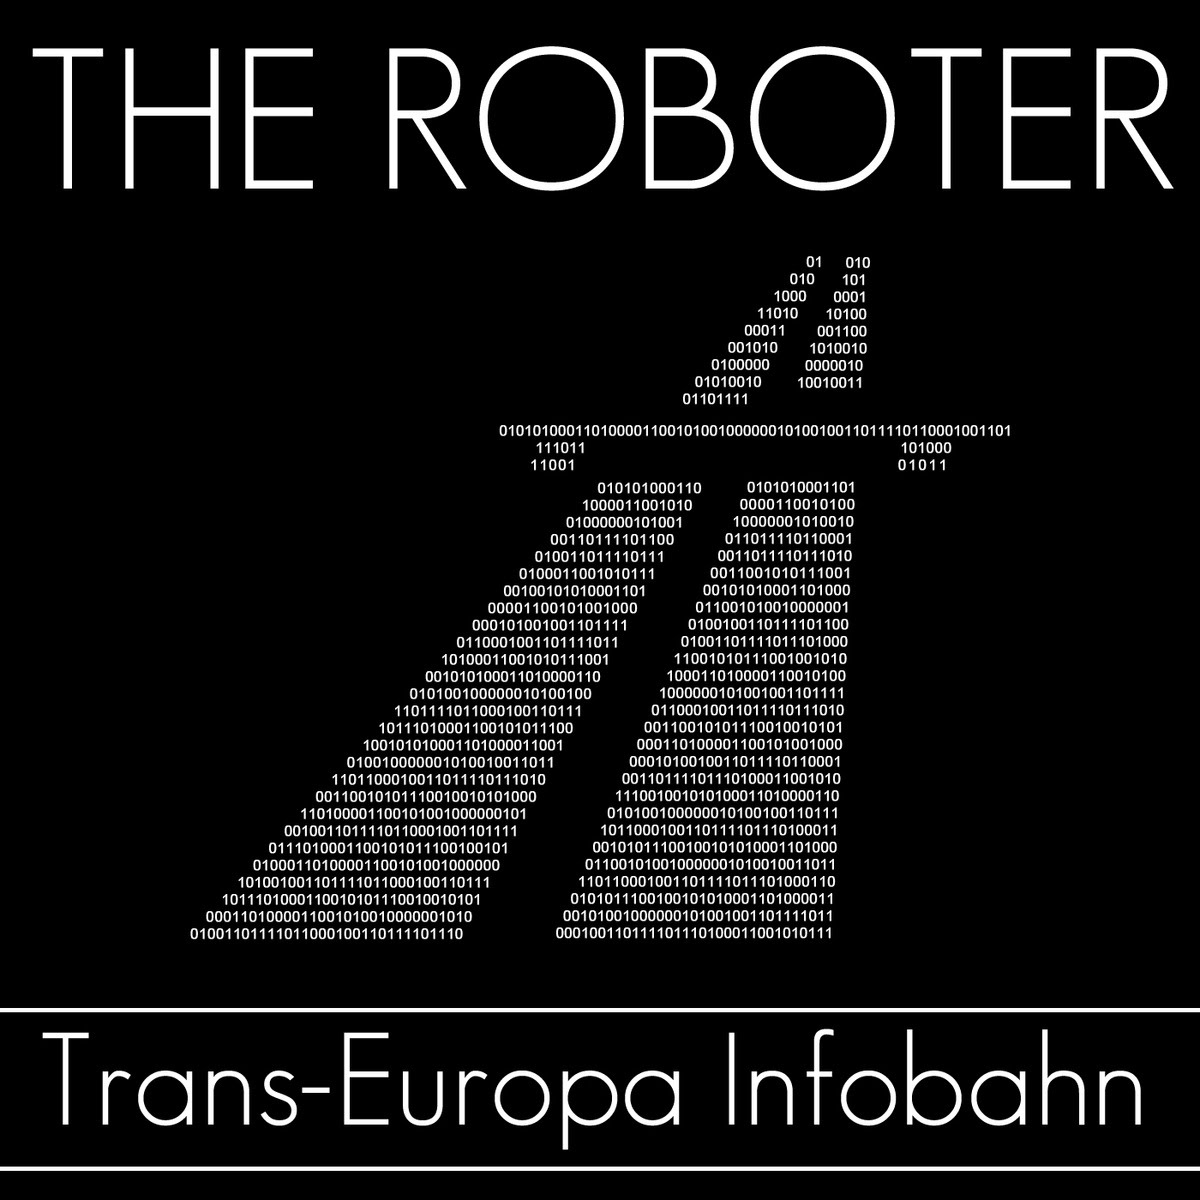 https://theroboter.bandcamp.com/album/trans-europa-infobahn